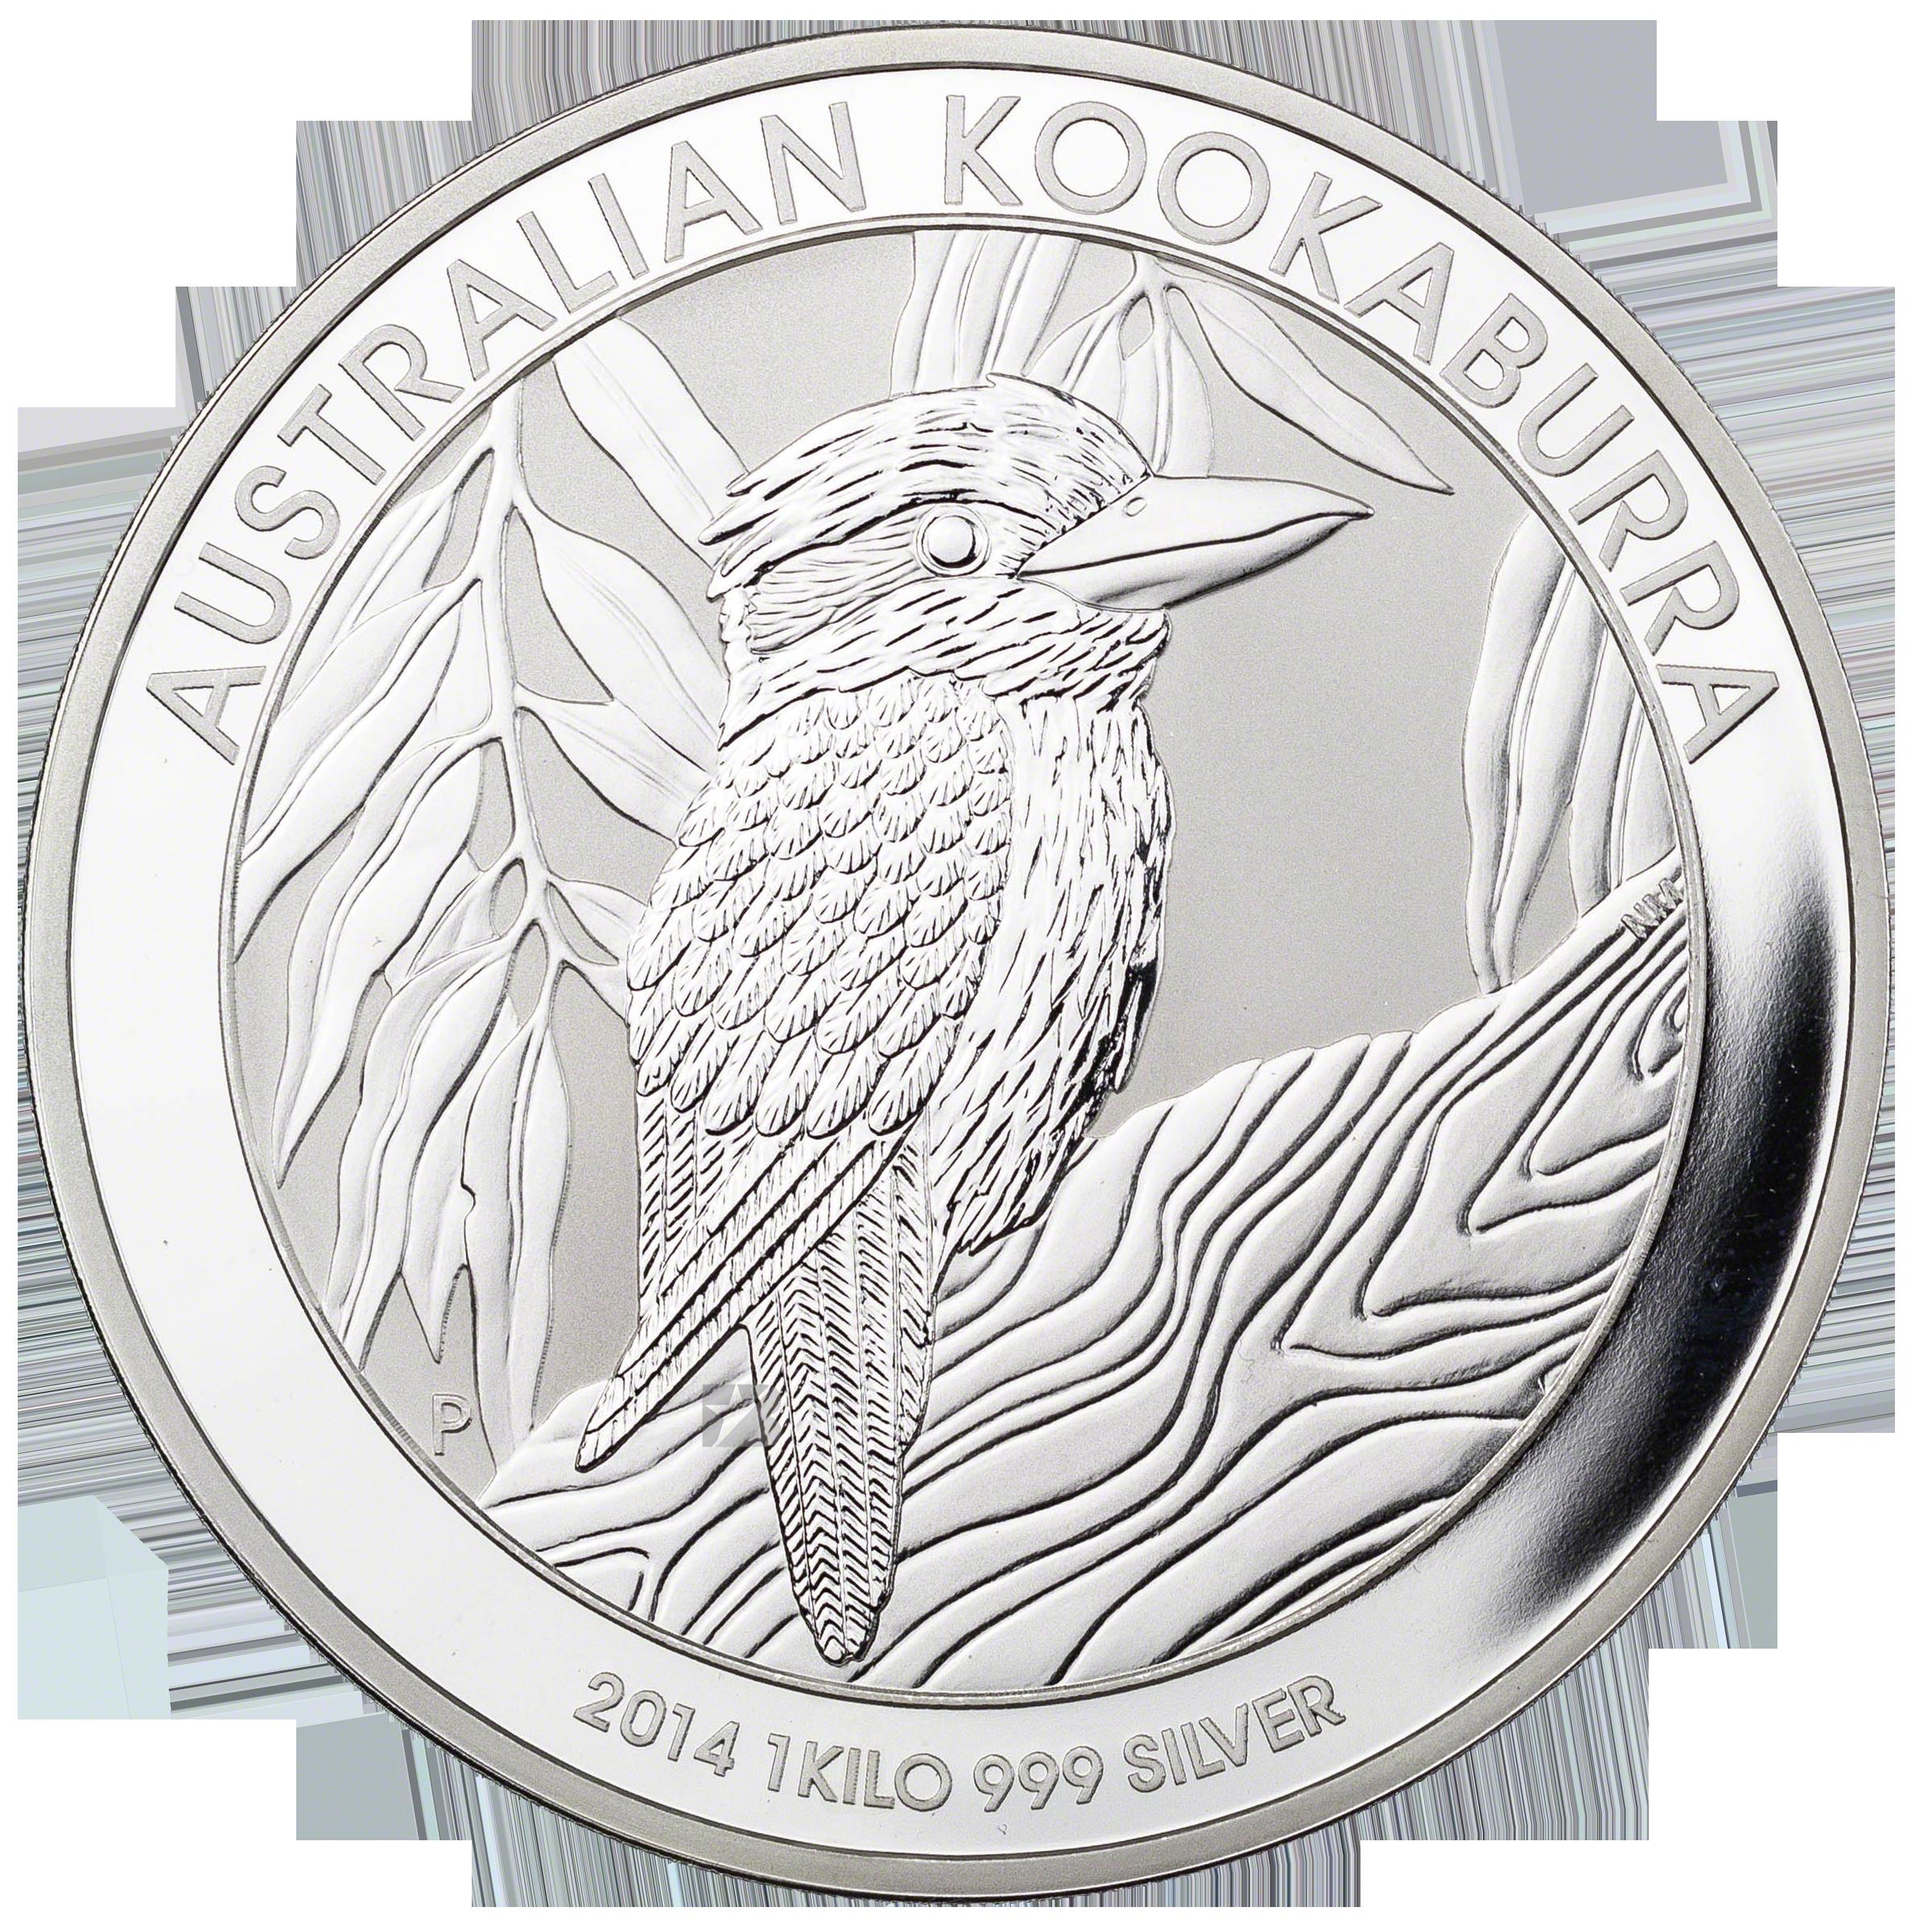 Australian Silver Kookaburra 2014 1 Kg